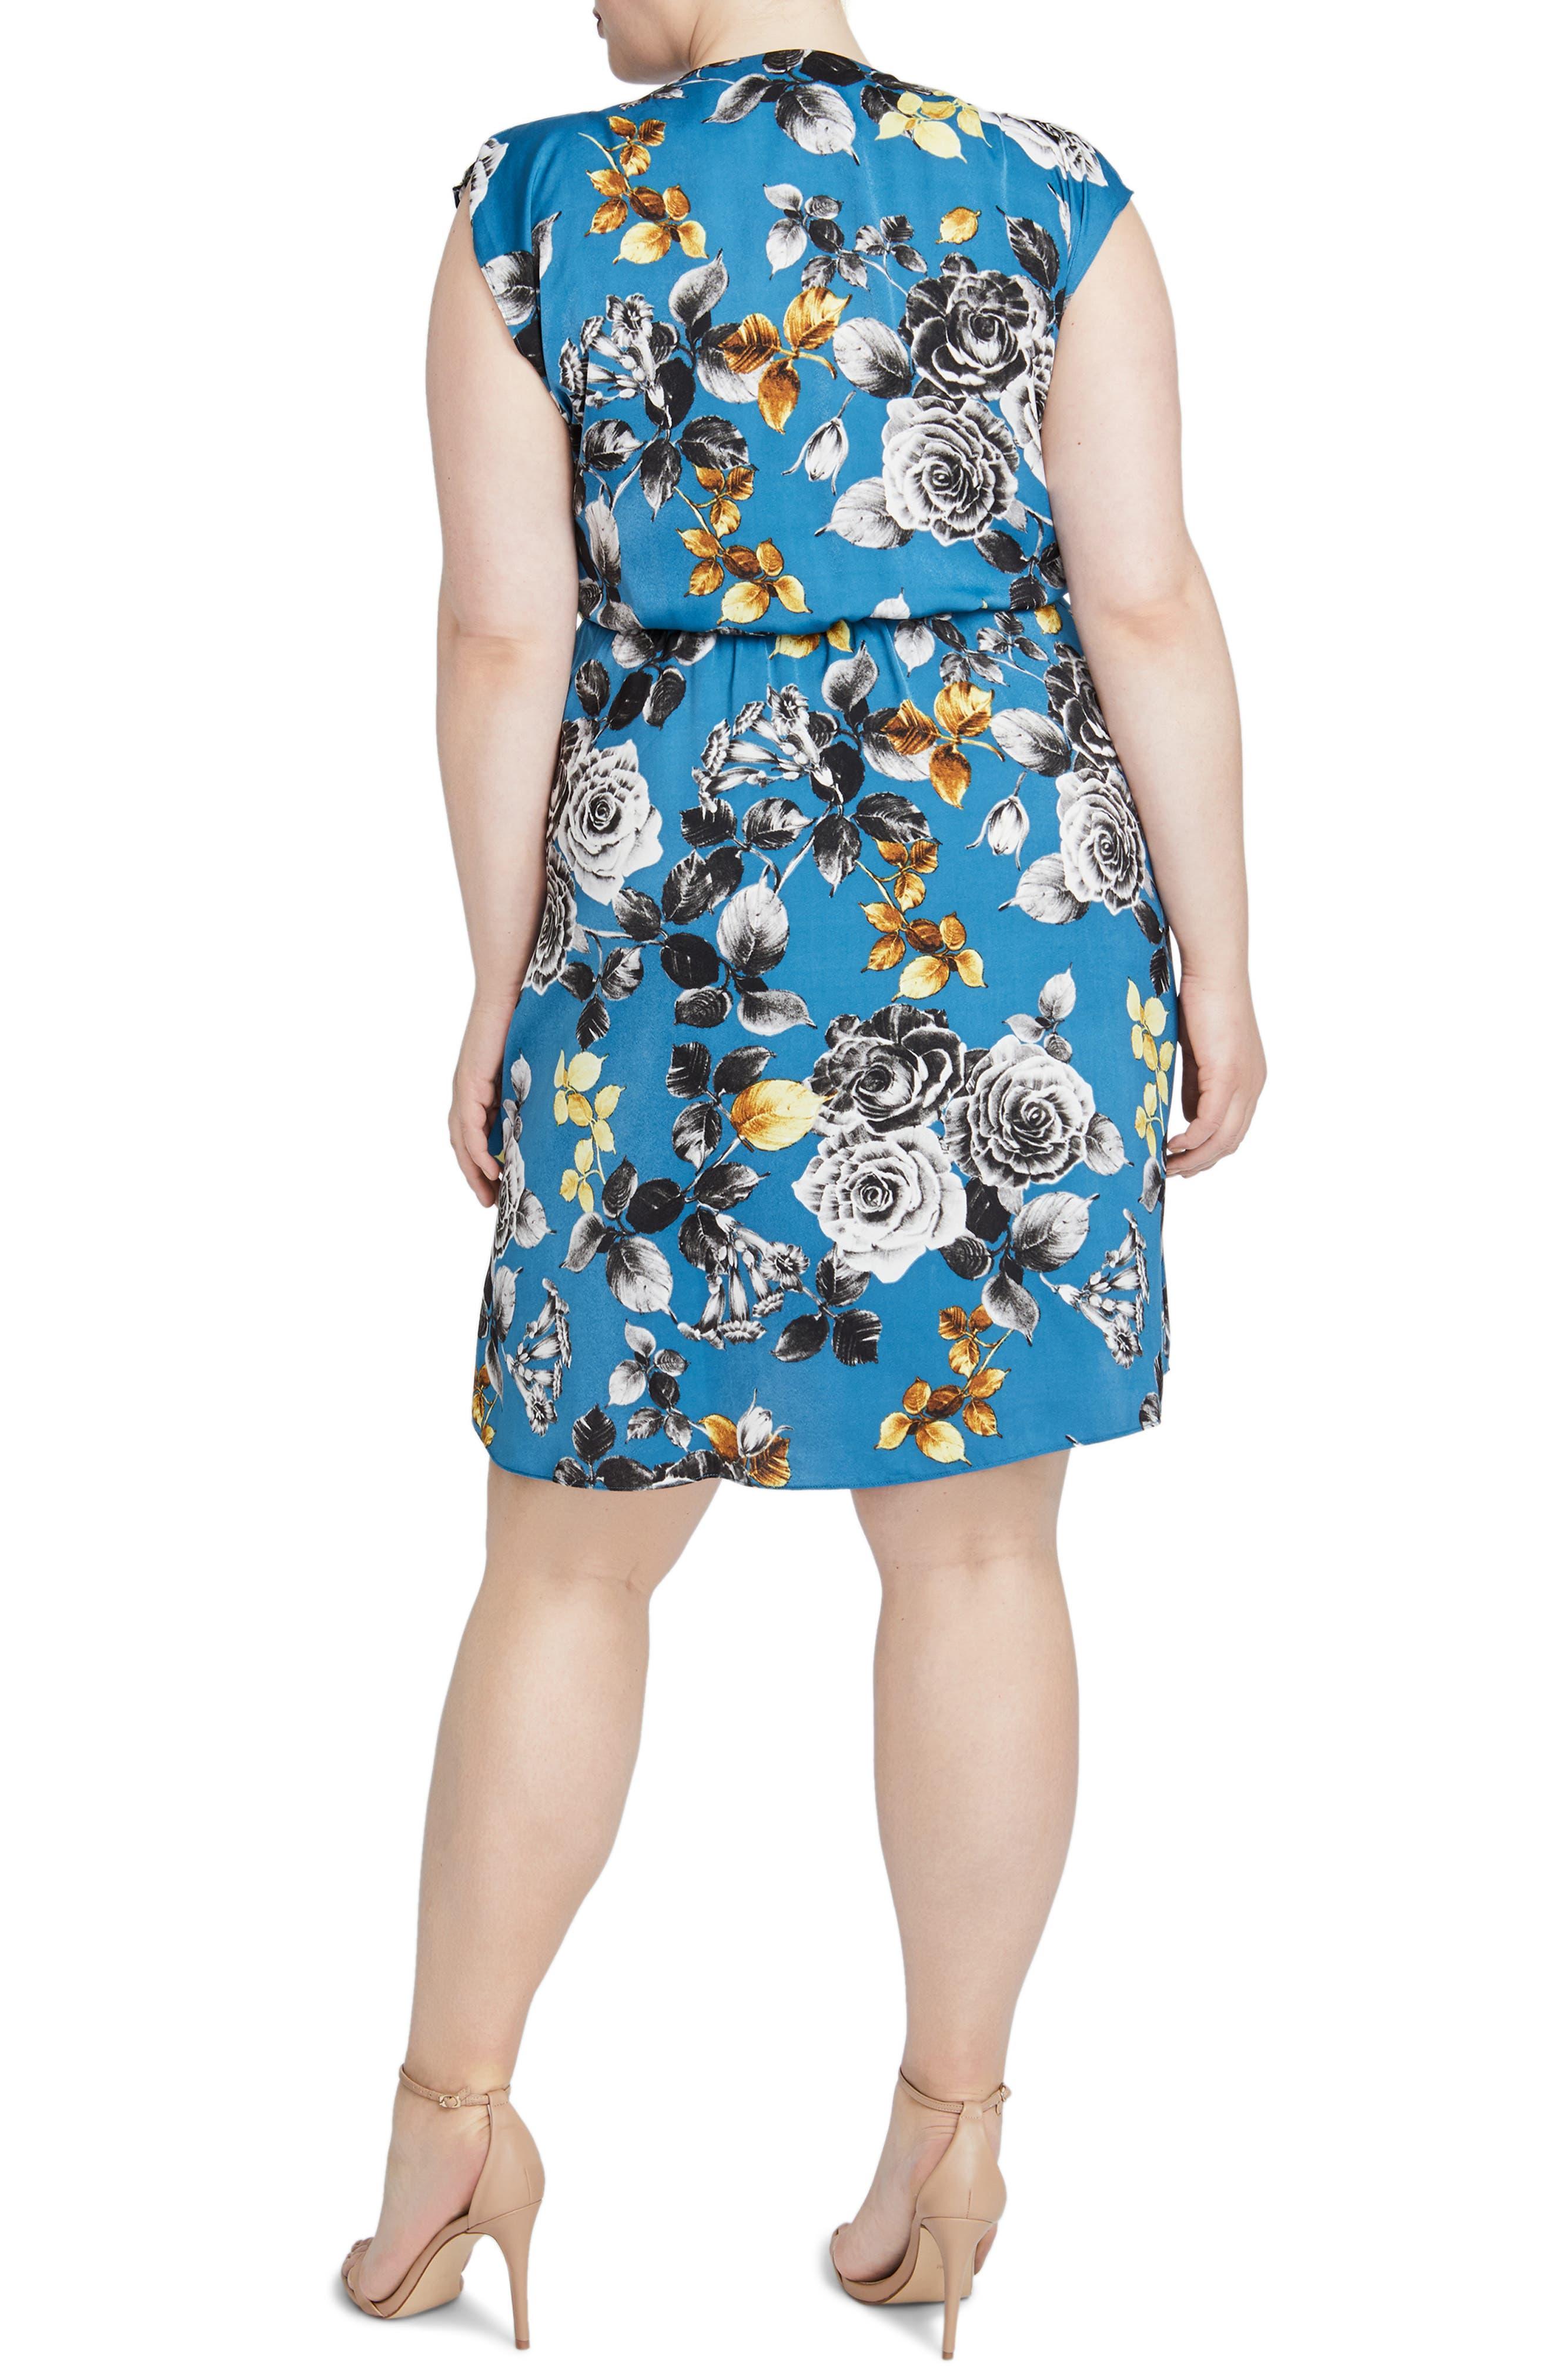 Pierce Floral Dress,                             Alternate thumbnail 2, color,                             TEAL BLUE COMBO